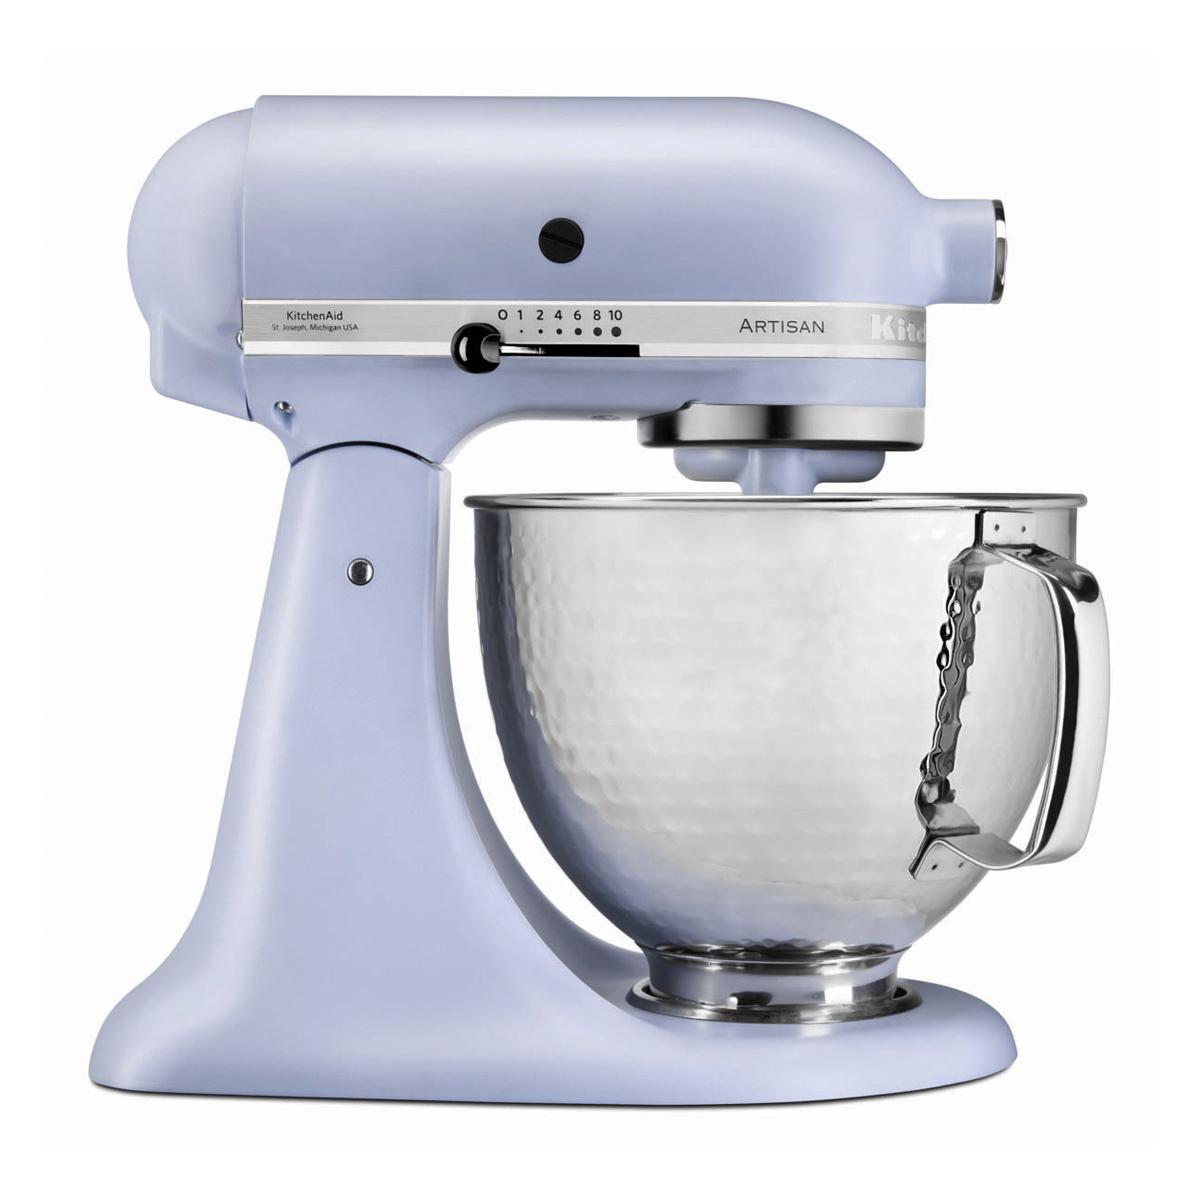 Kitchenaid Artisan 4 8l Stand Mixer Limited Edition Matte